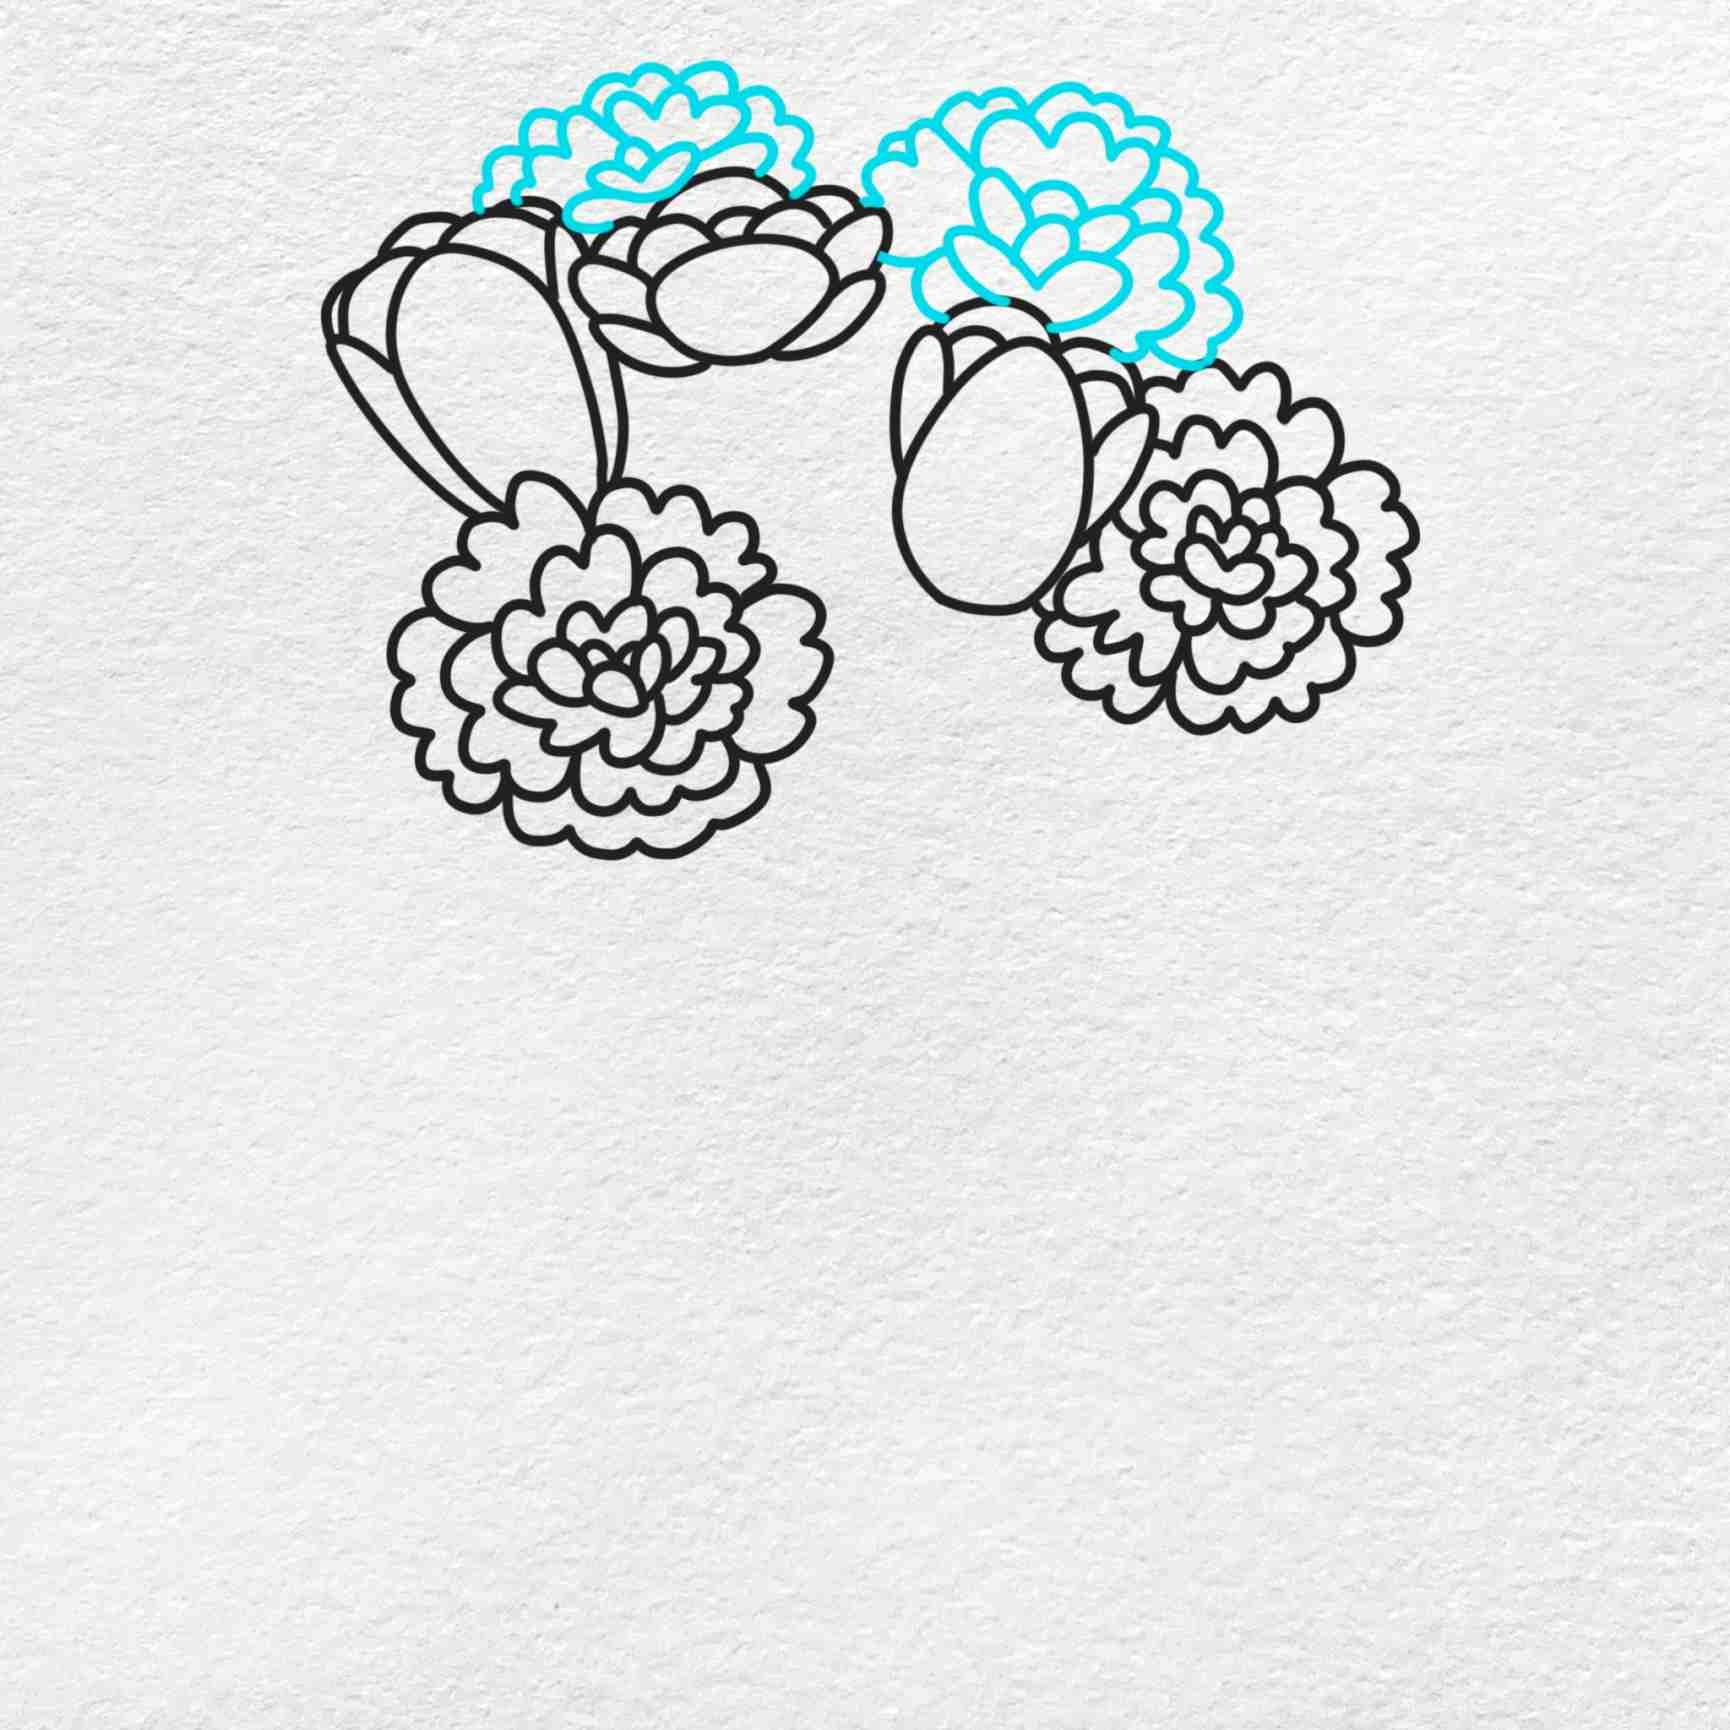 Spring Flowers Drawing: Step 4